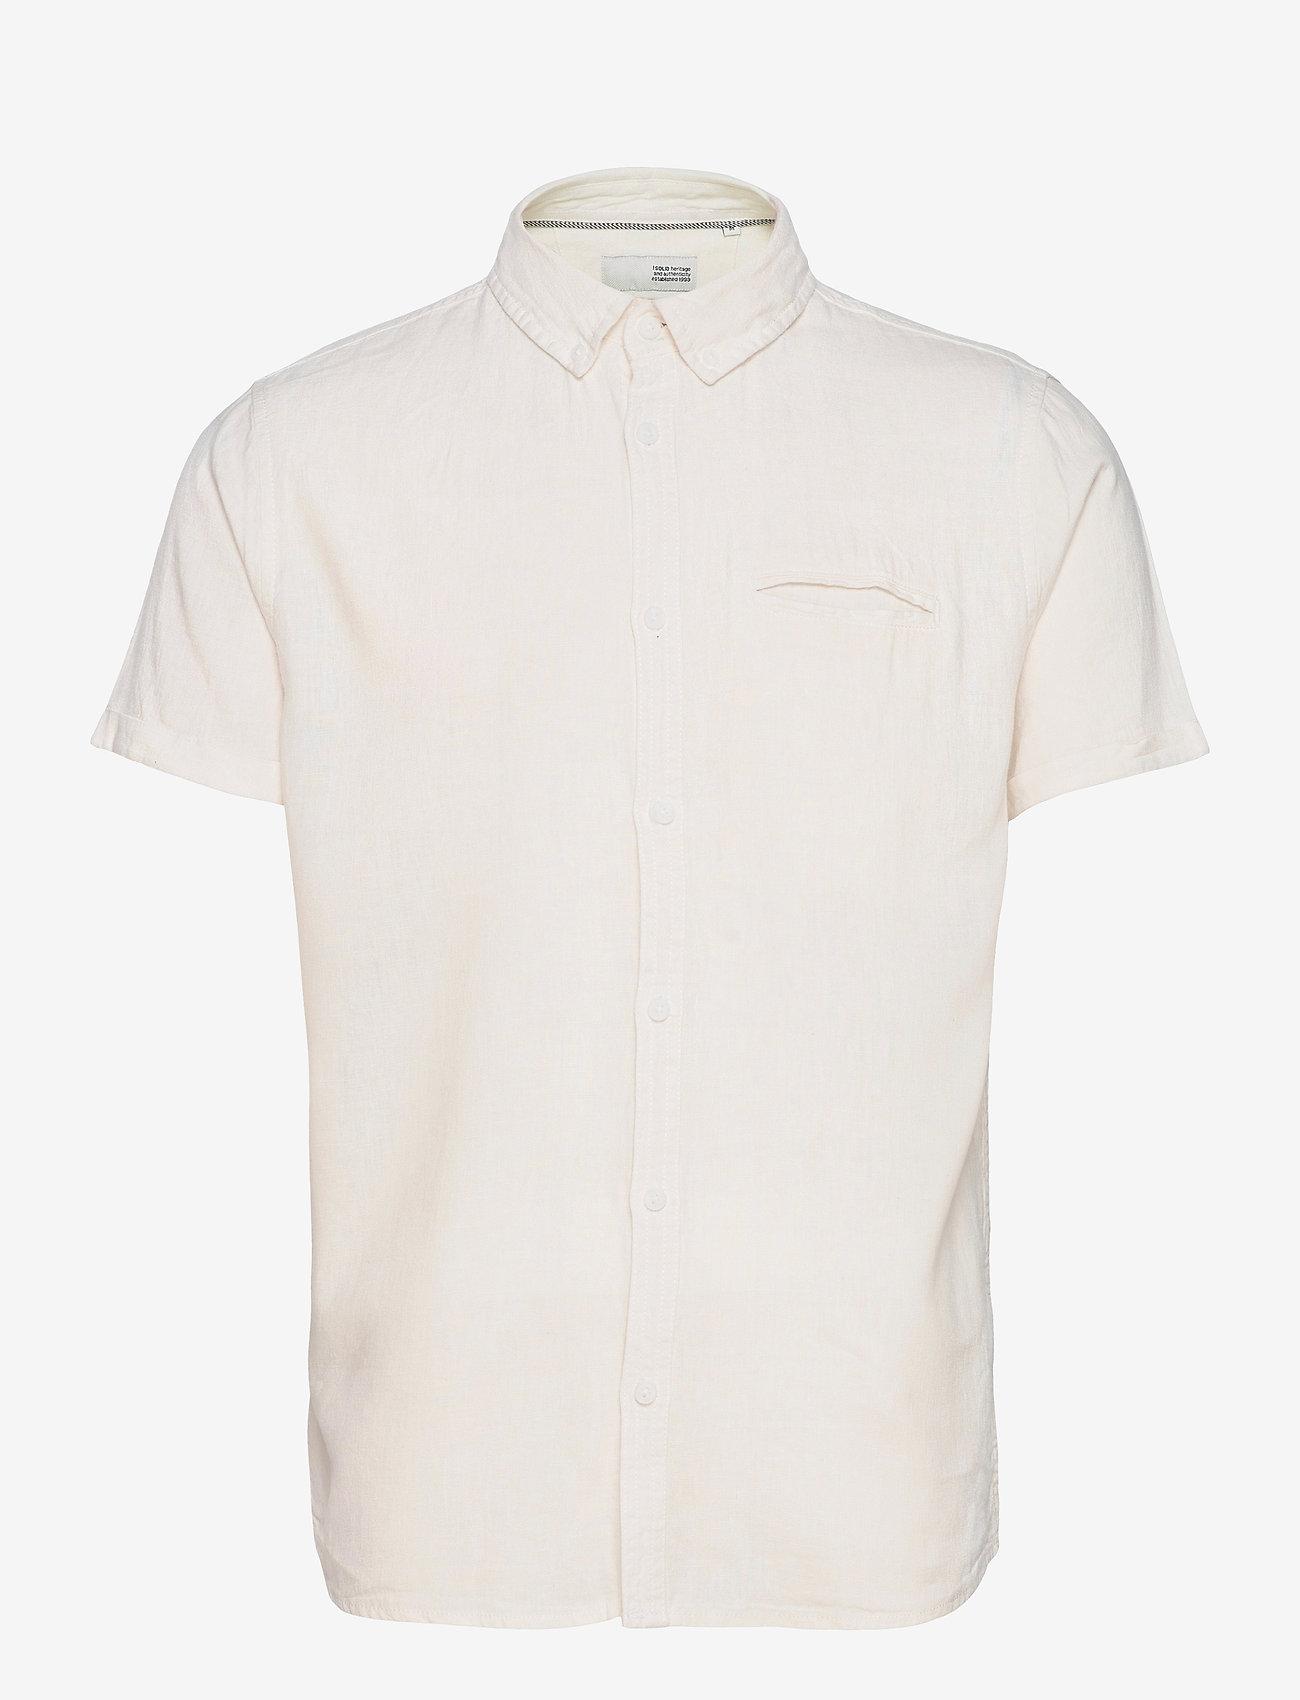 Solid - SDReginald - koszule w kratkę - white - 0